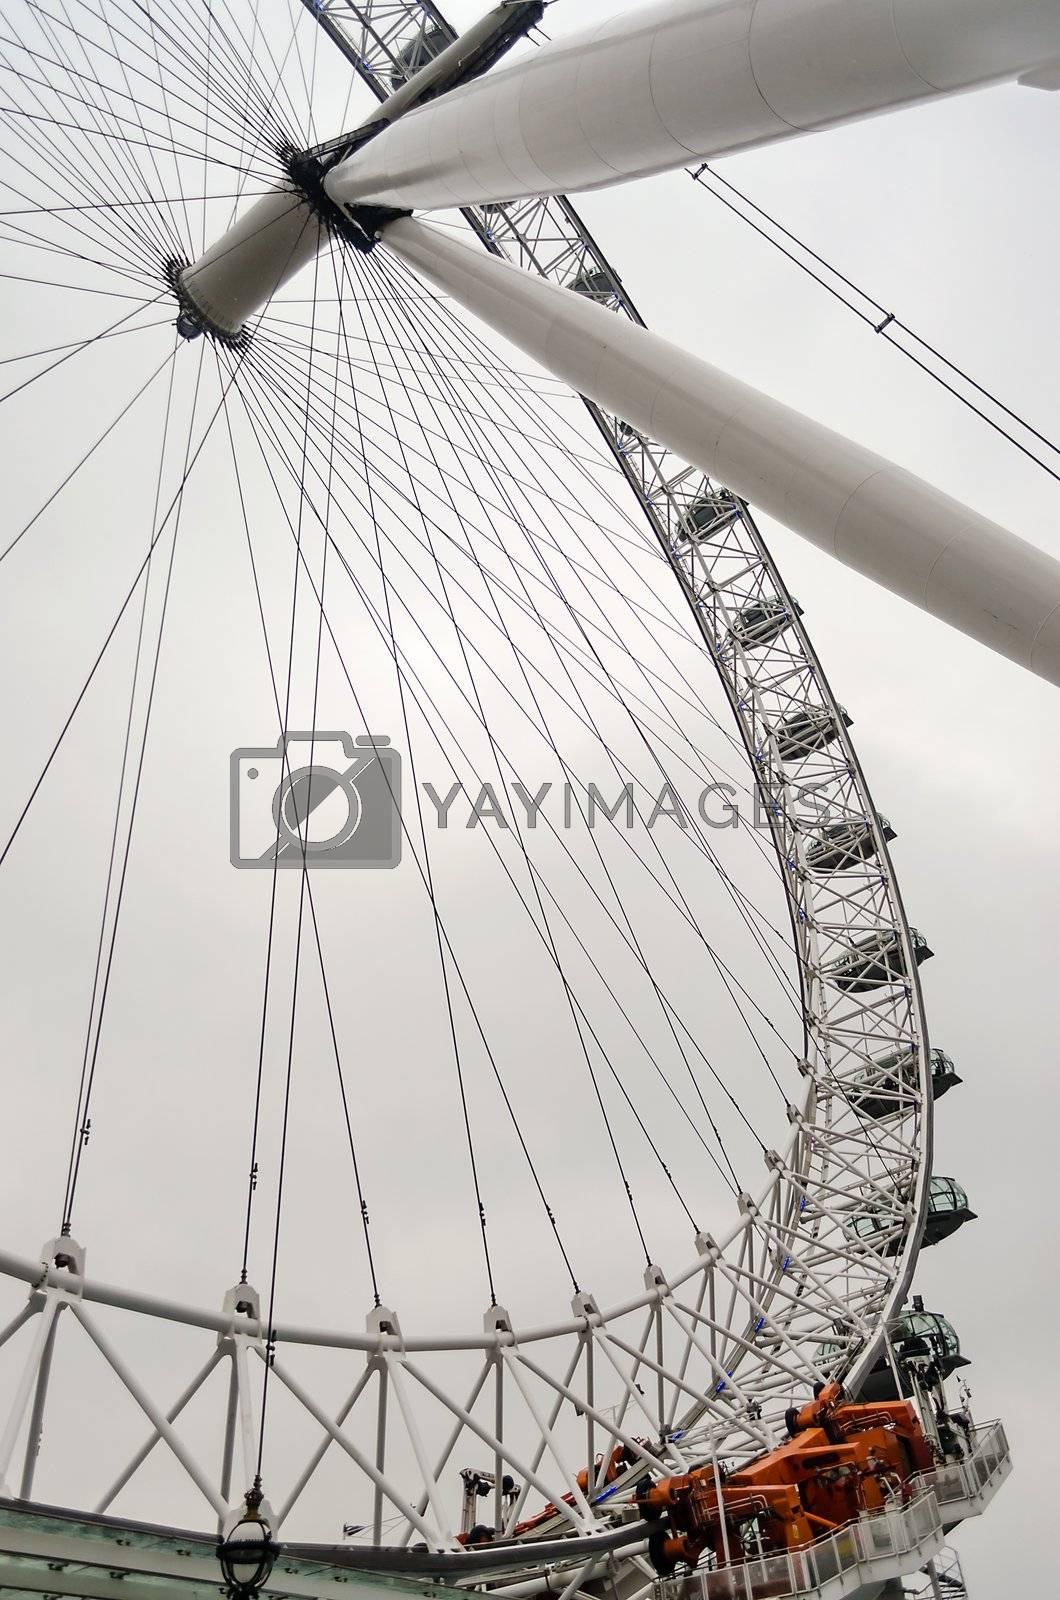 The London Eye Panoramic Wheel